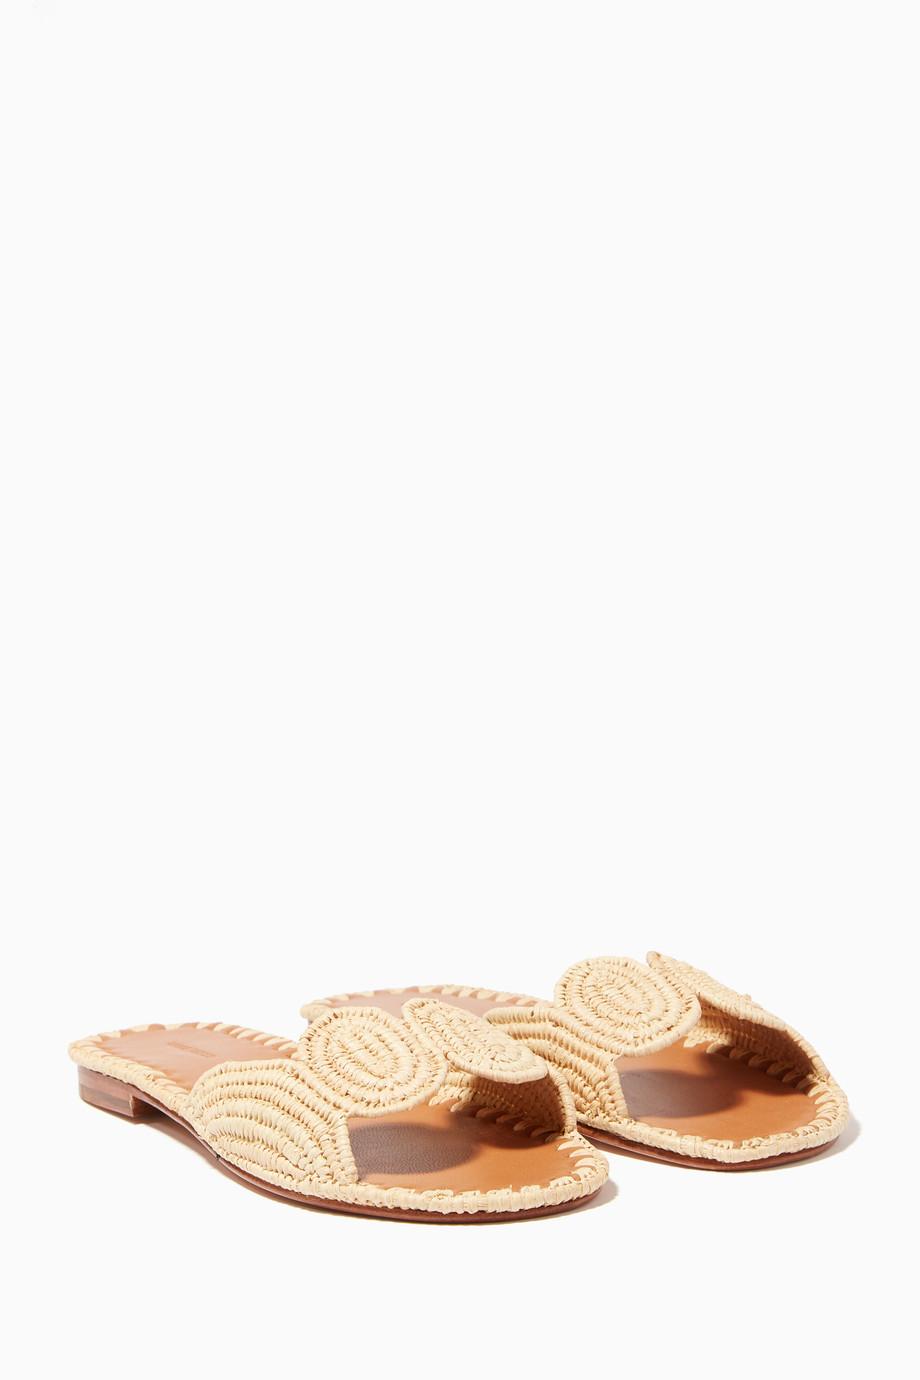 8ade943abad6 Shop Carrie Forbes Brown Light-Beige Raffia Naima Slides for Women ...